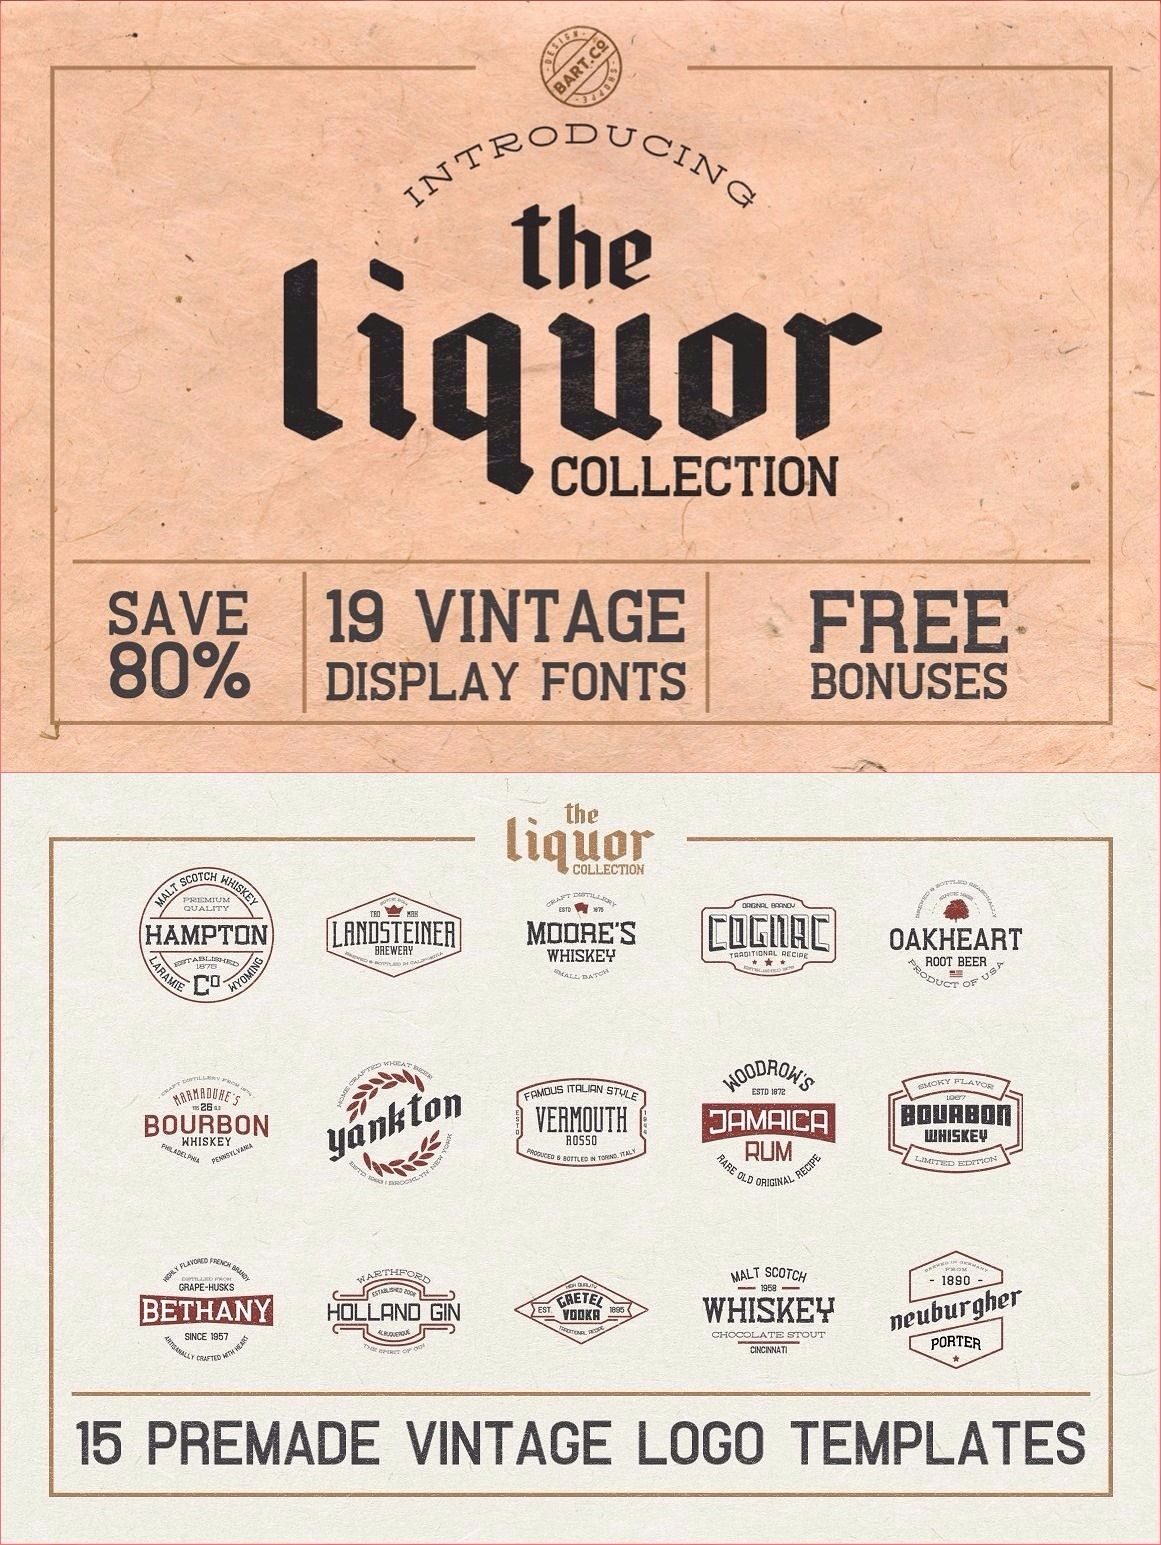 The Liquor Font Collection Logo Design Inspiration Vintage Vintage Logo Design Vintage Logo